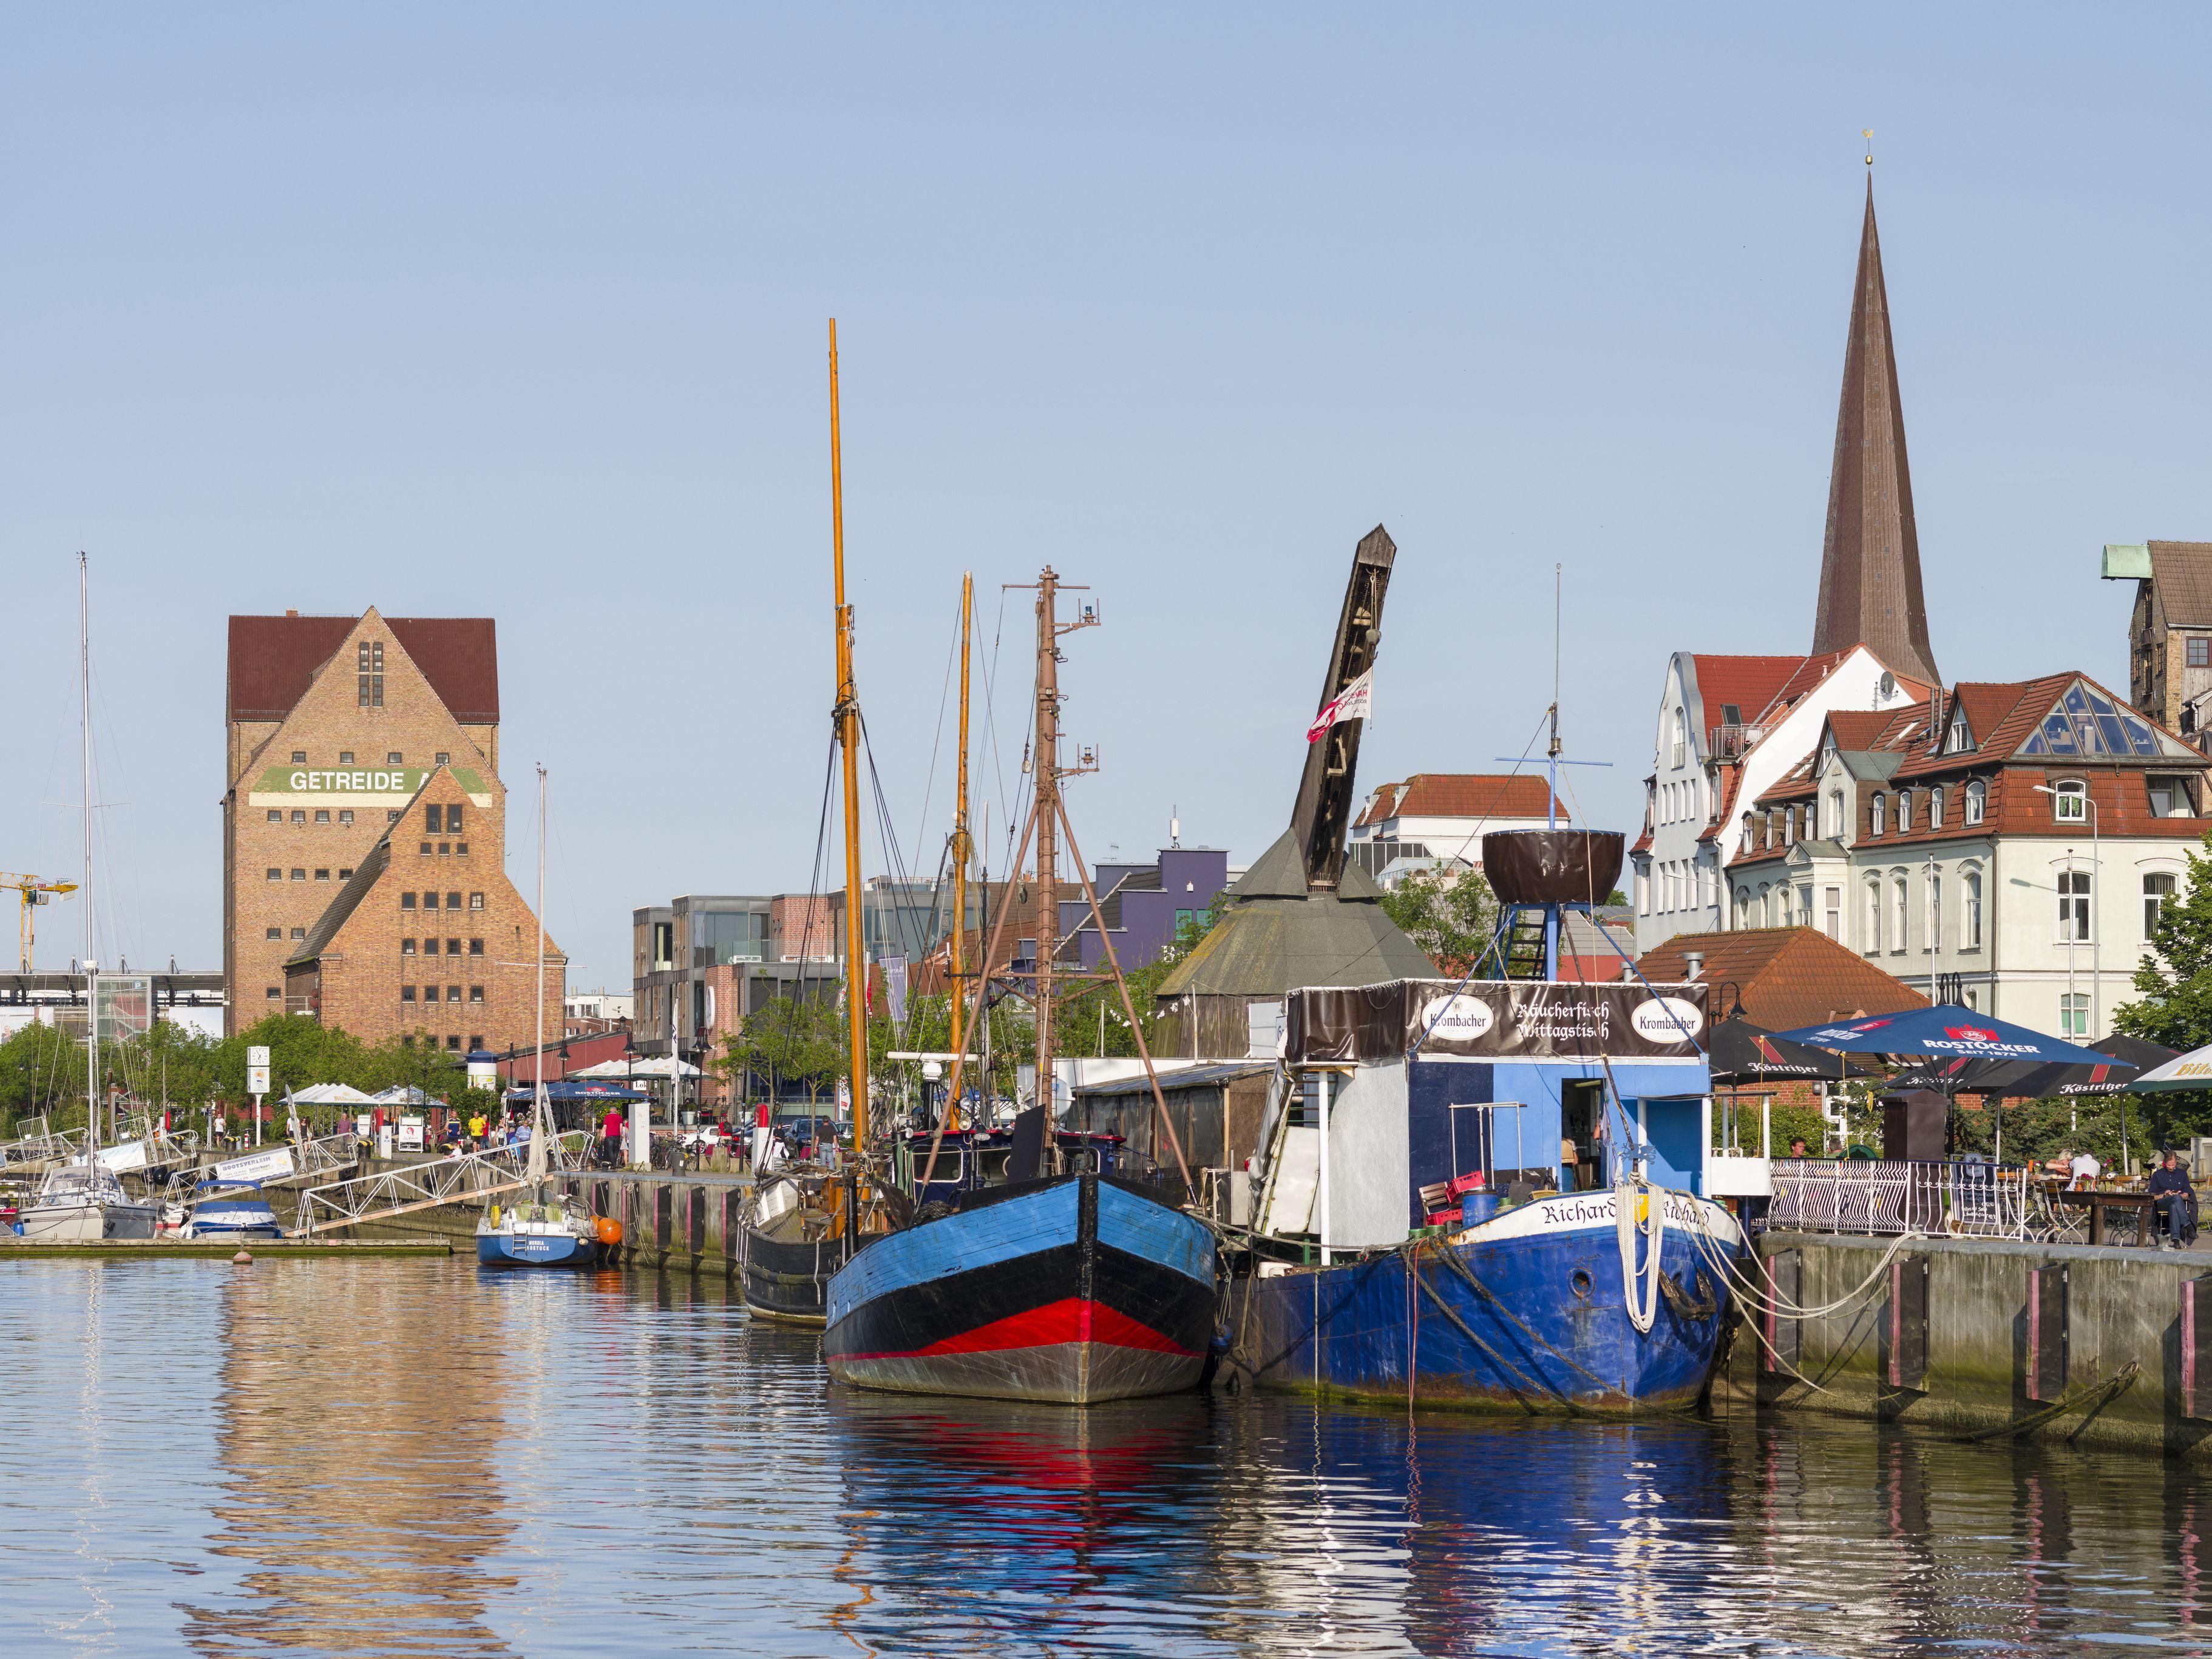 Harbor at Unterwarnow, Rostock, Mecklenburg-Western Pomerania, Germany